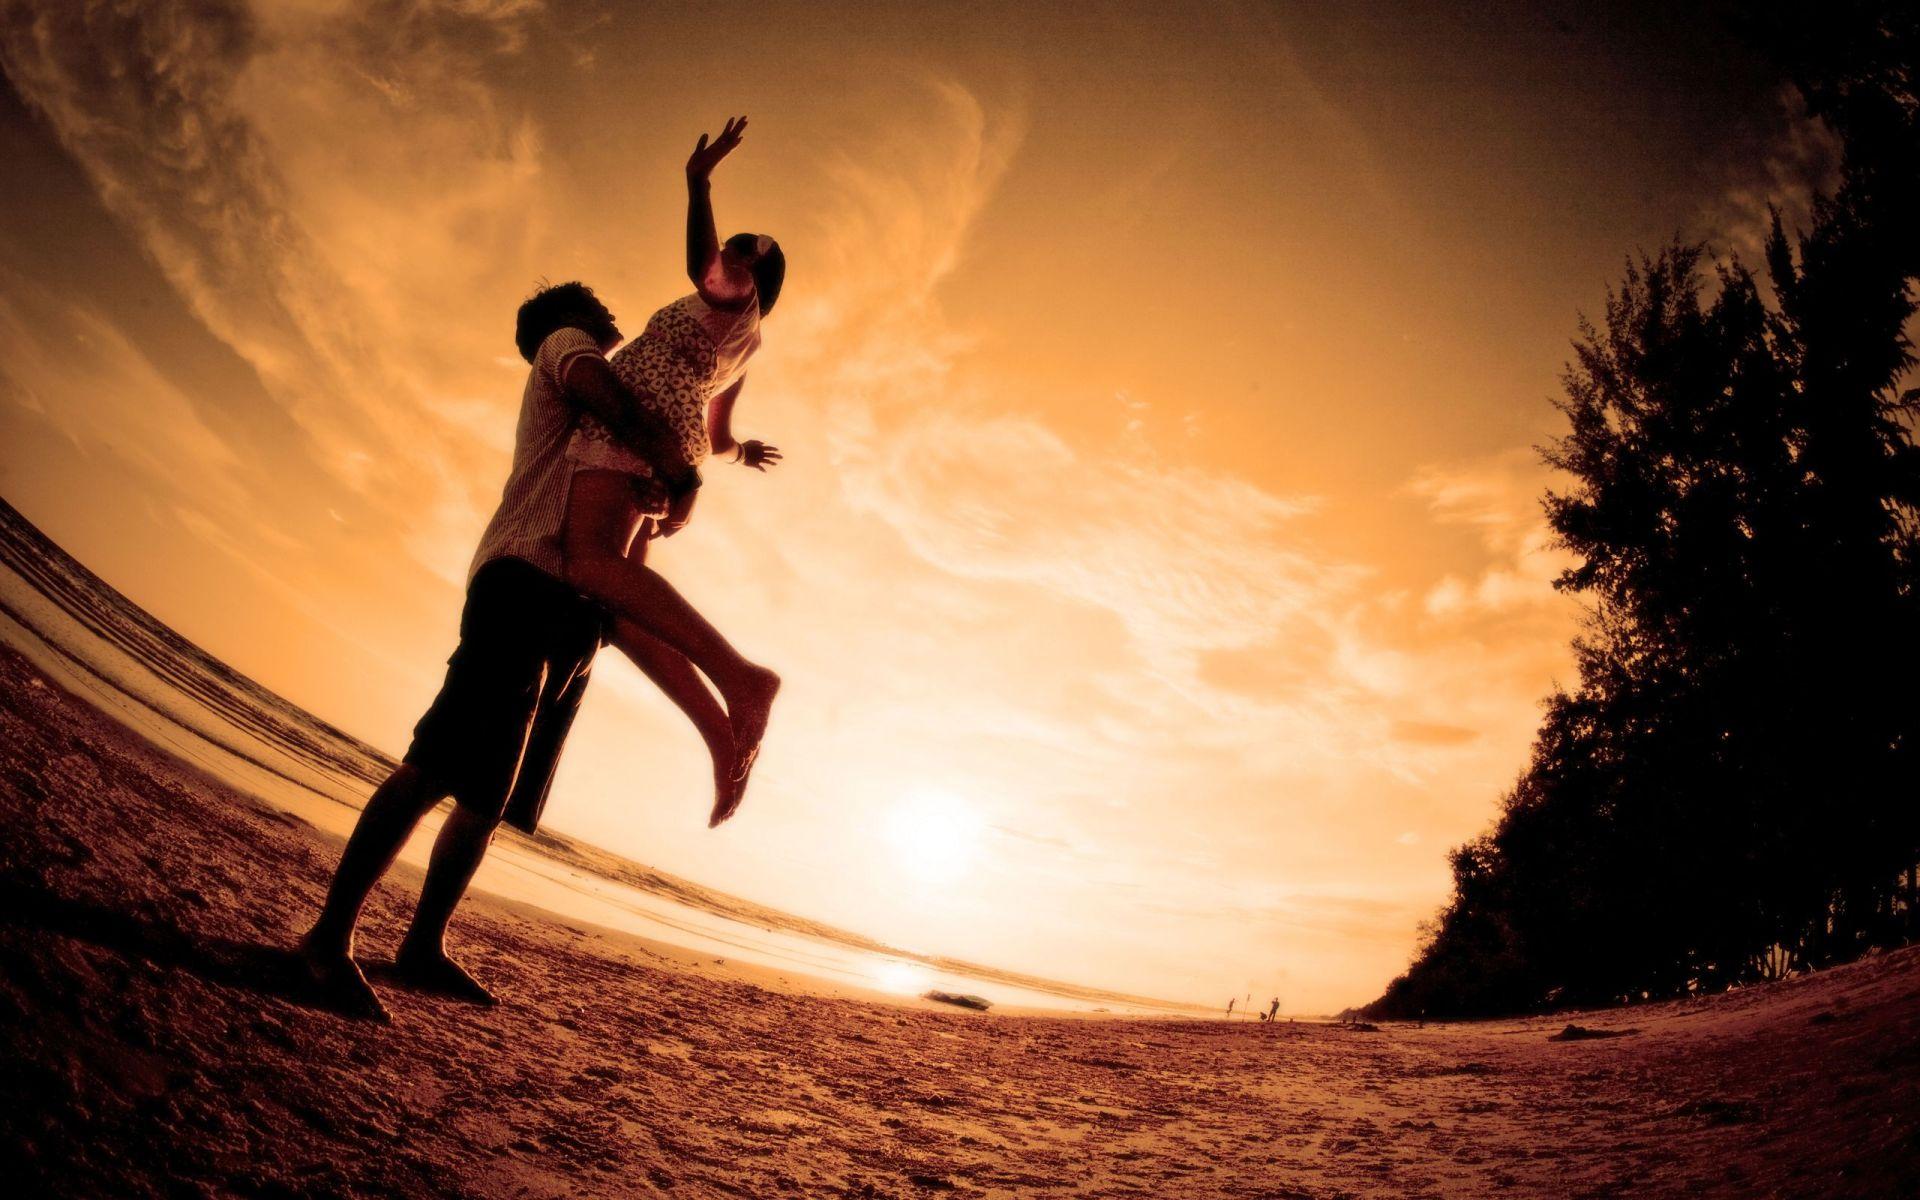 Fifty Shadesof Yes - The Art of Playfully Pushing Edges (Part 2)